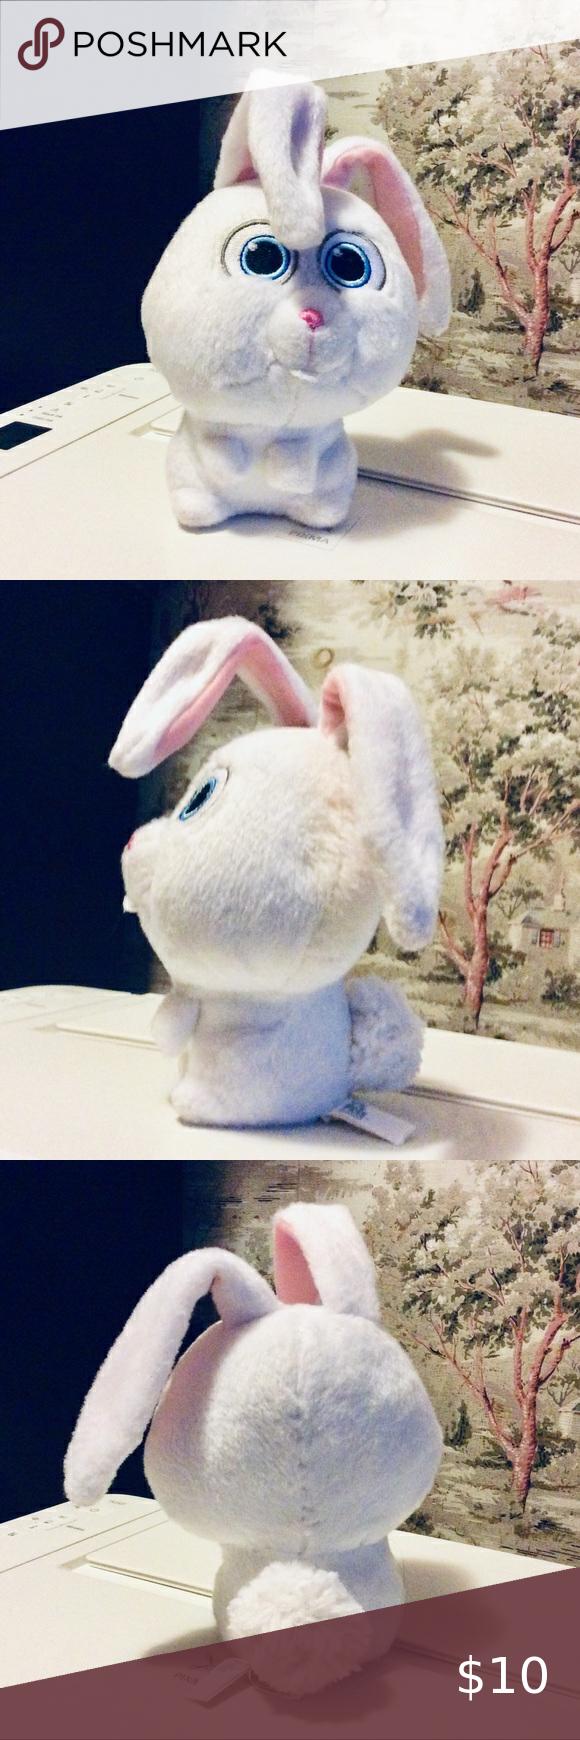 Secret Life Of Pets Snowball Bunny Rabbit Plush In 2020 Cute